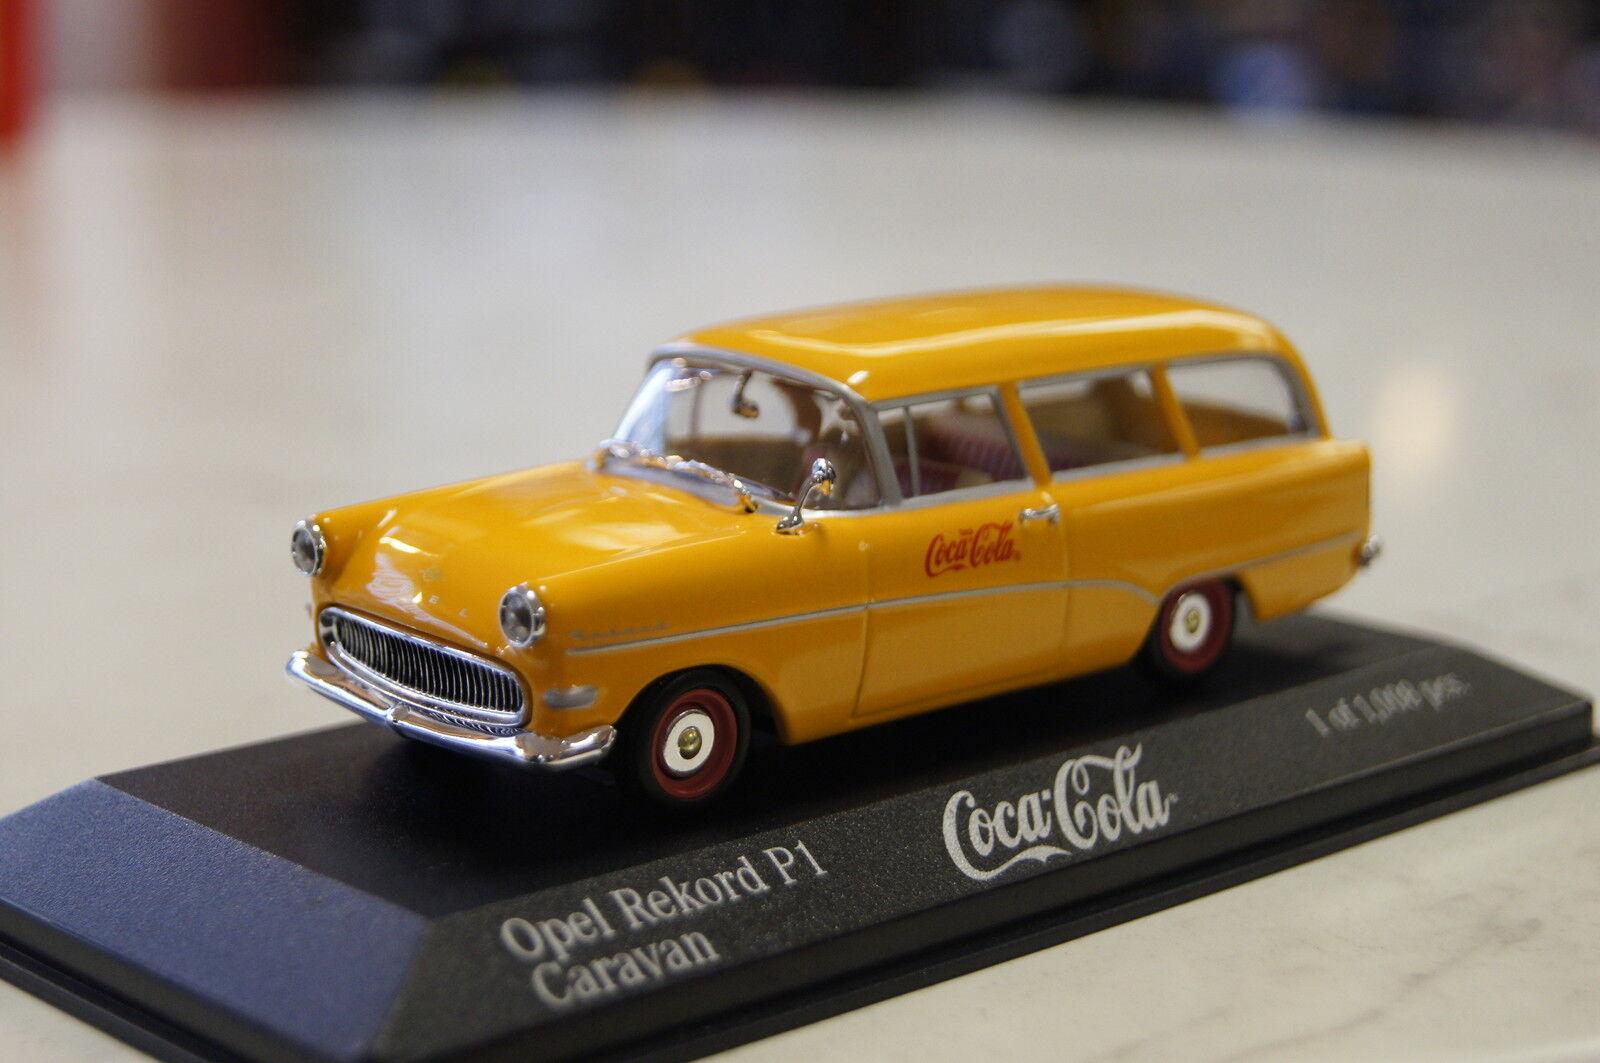 Opel Rekord p1 Caravan  Coca Cola  1958 Yellow 1 43 Minichamps NEW & OVP